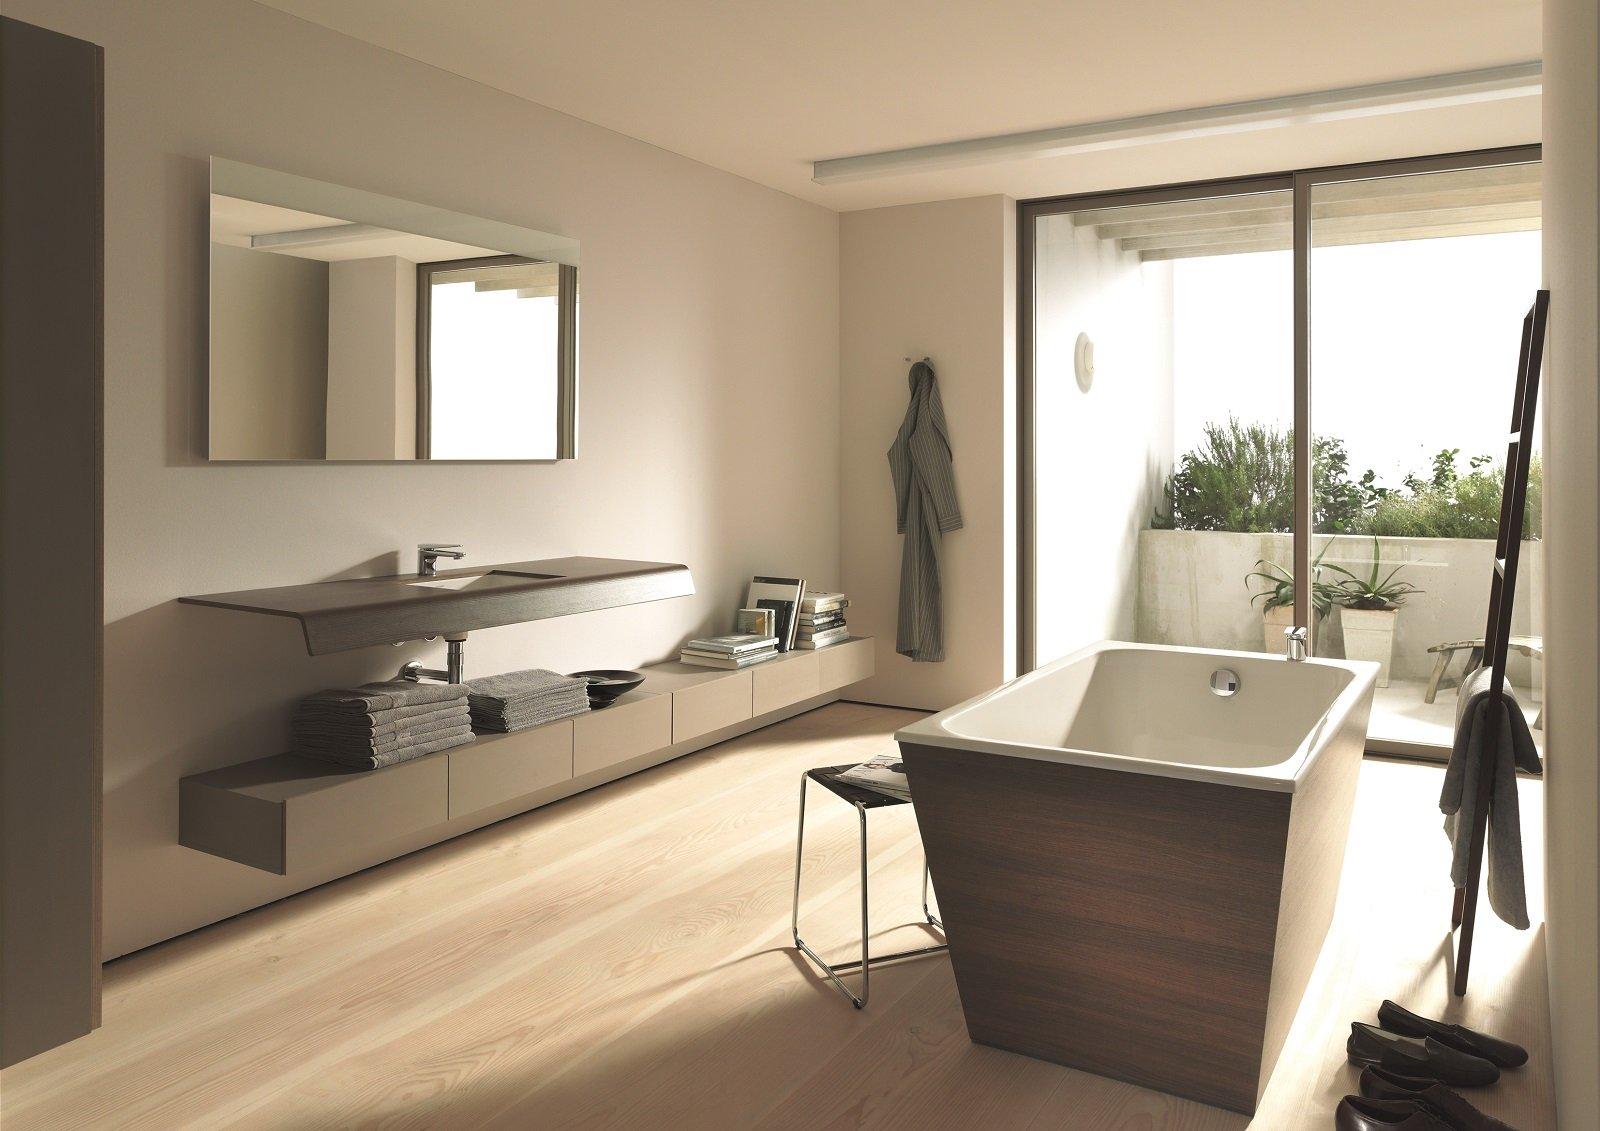 Vasca Da Bagno Angolare 120x120 : Misure standard vasche da bagno luxury duravit srbija darling new